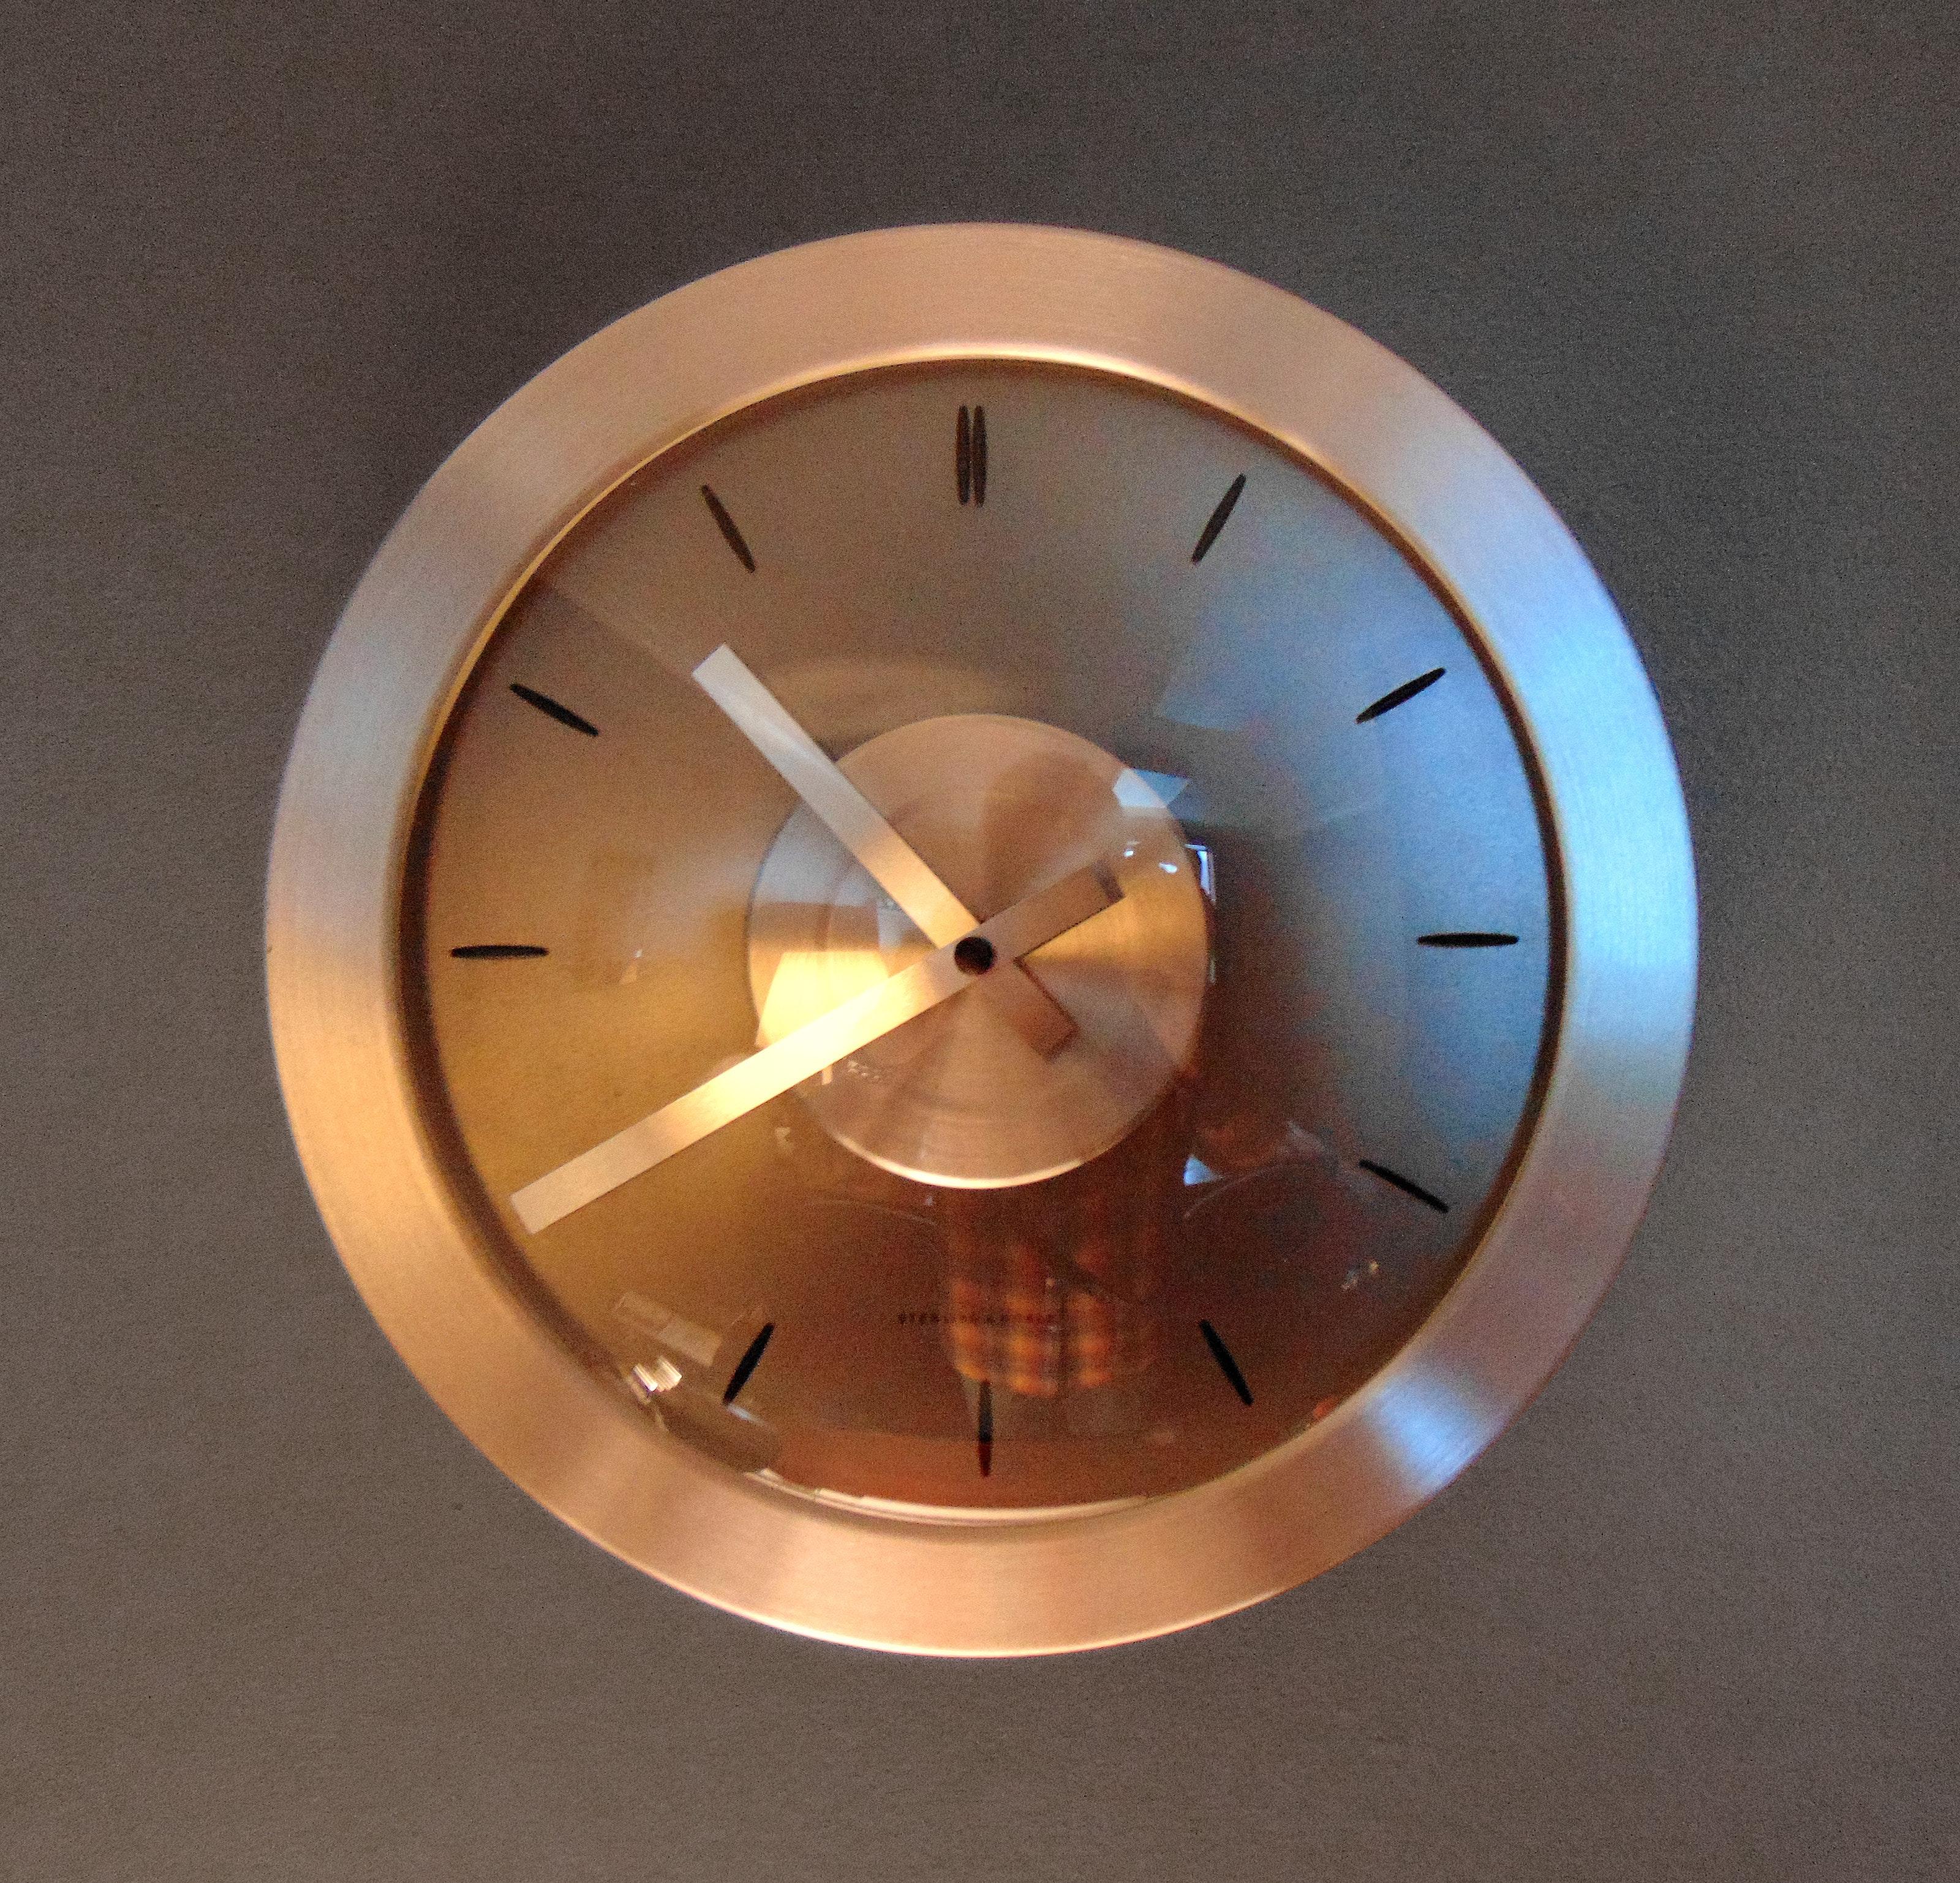 Round Bronze Analog Wall Clock, Instrument, Watch, Timepiece, Time, HQ Photo